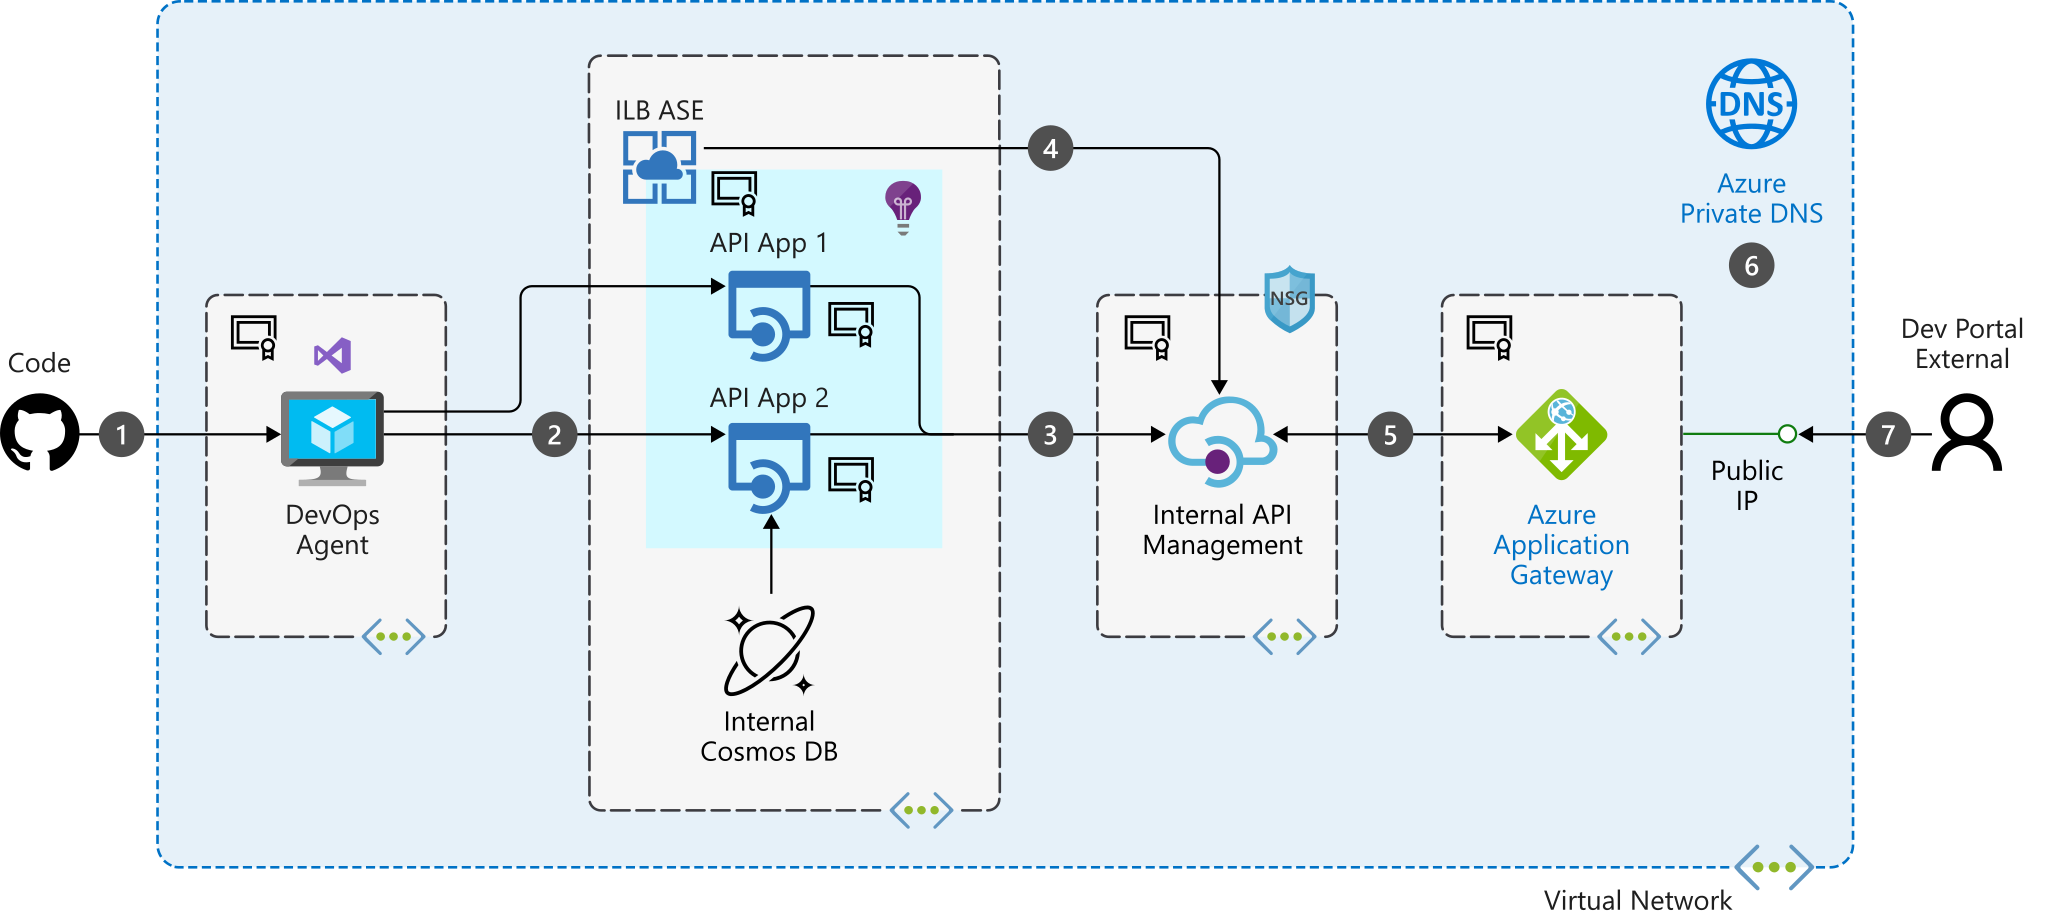 Publishing internal APIs to external consumers - Azure